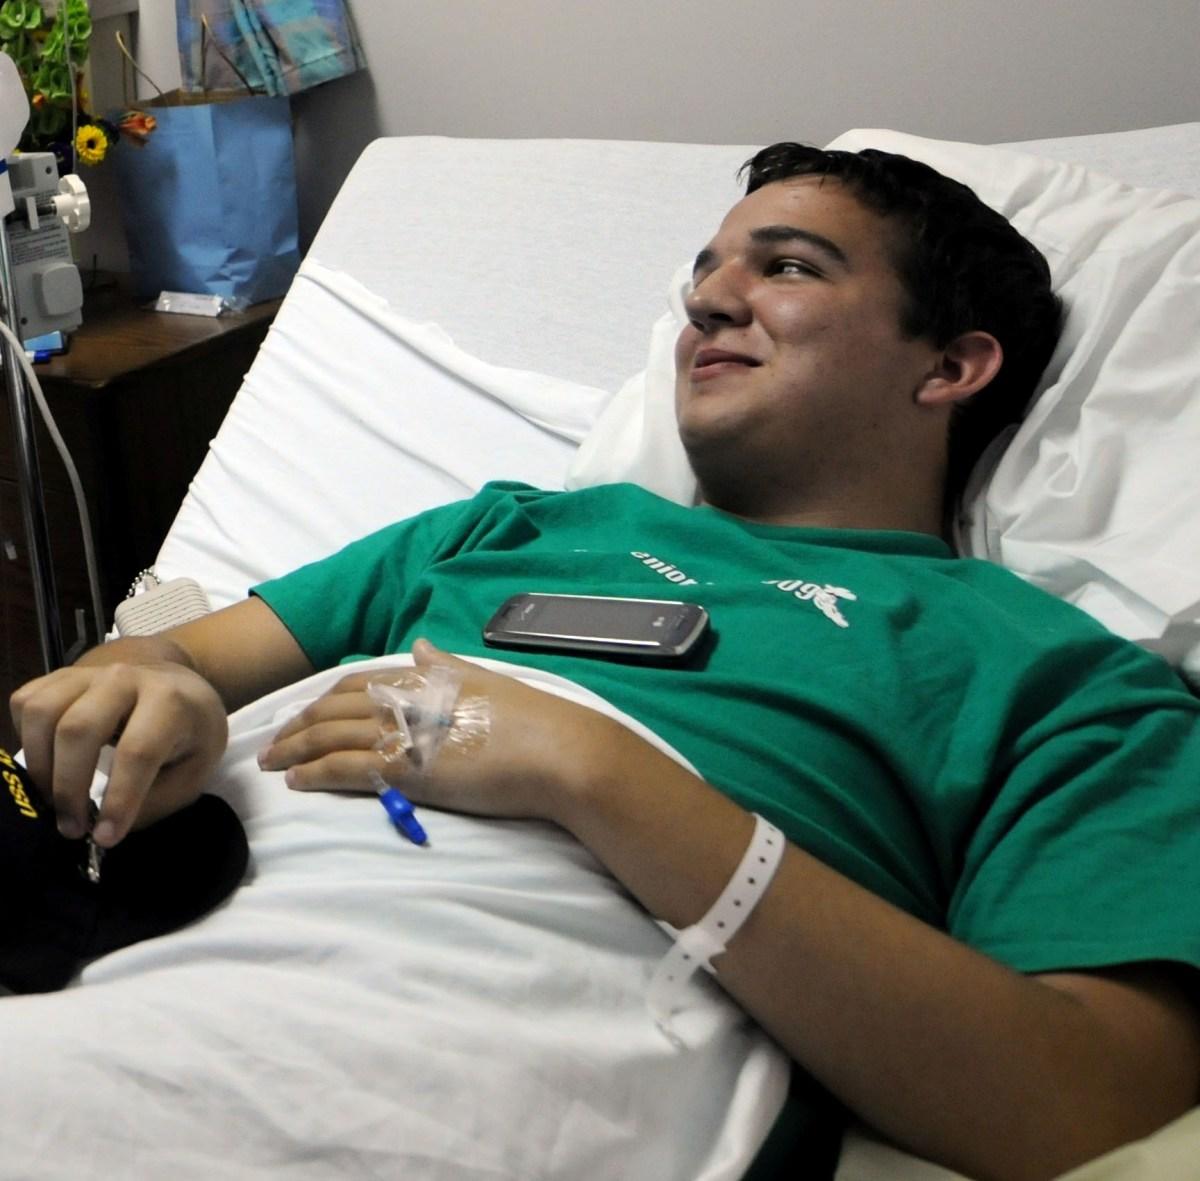 Gallbladder Surgery Recovery Time | YouMeMindBody